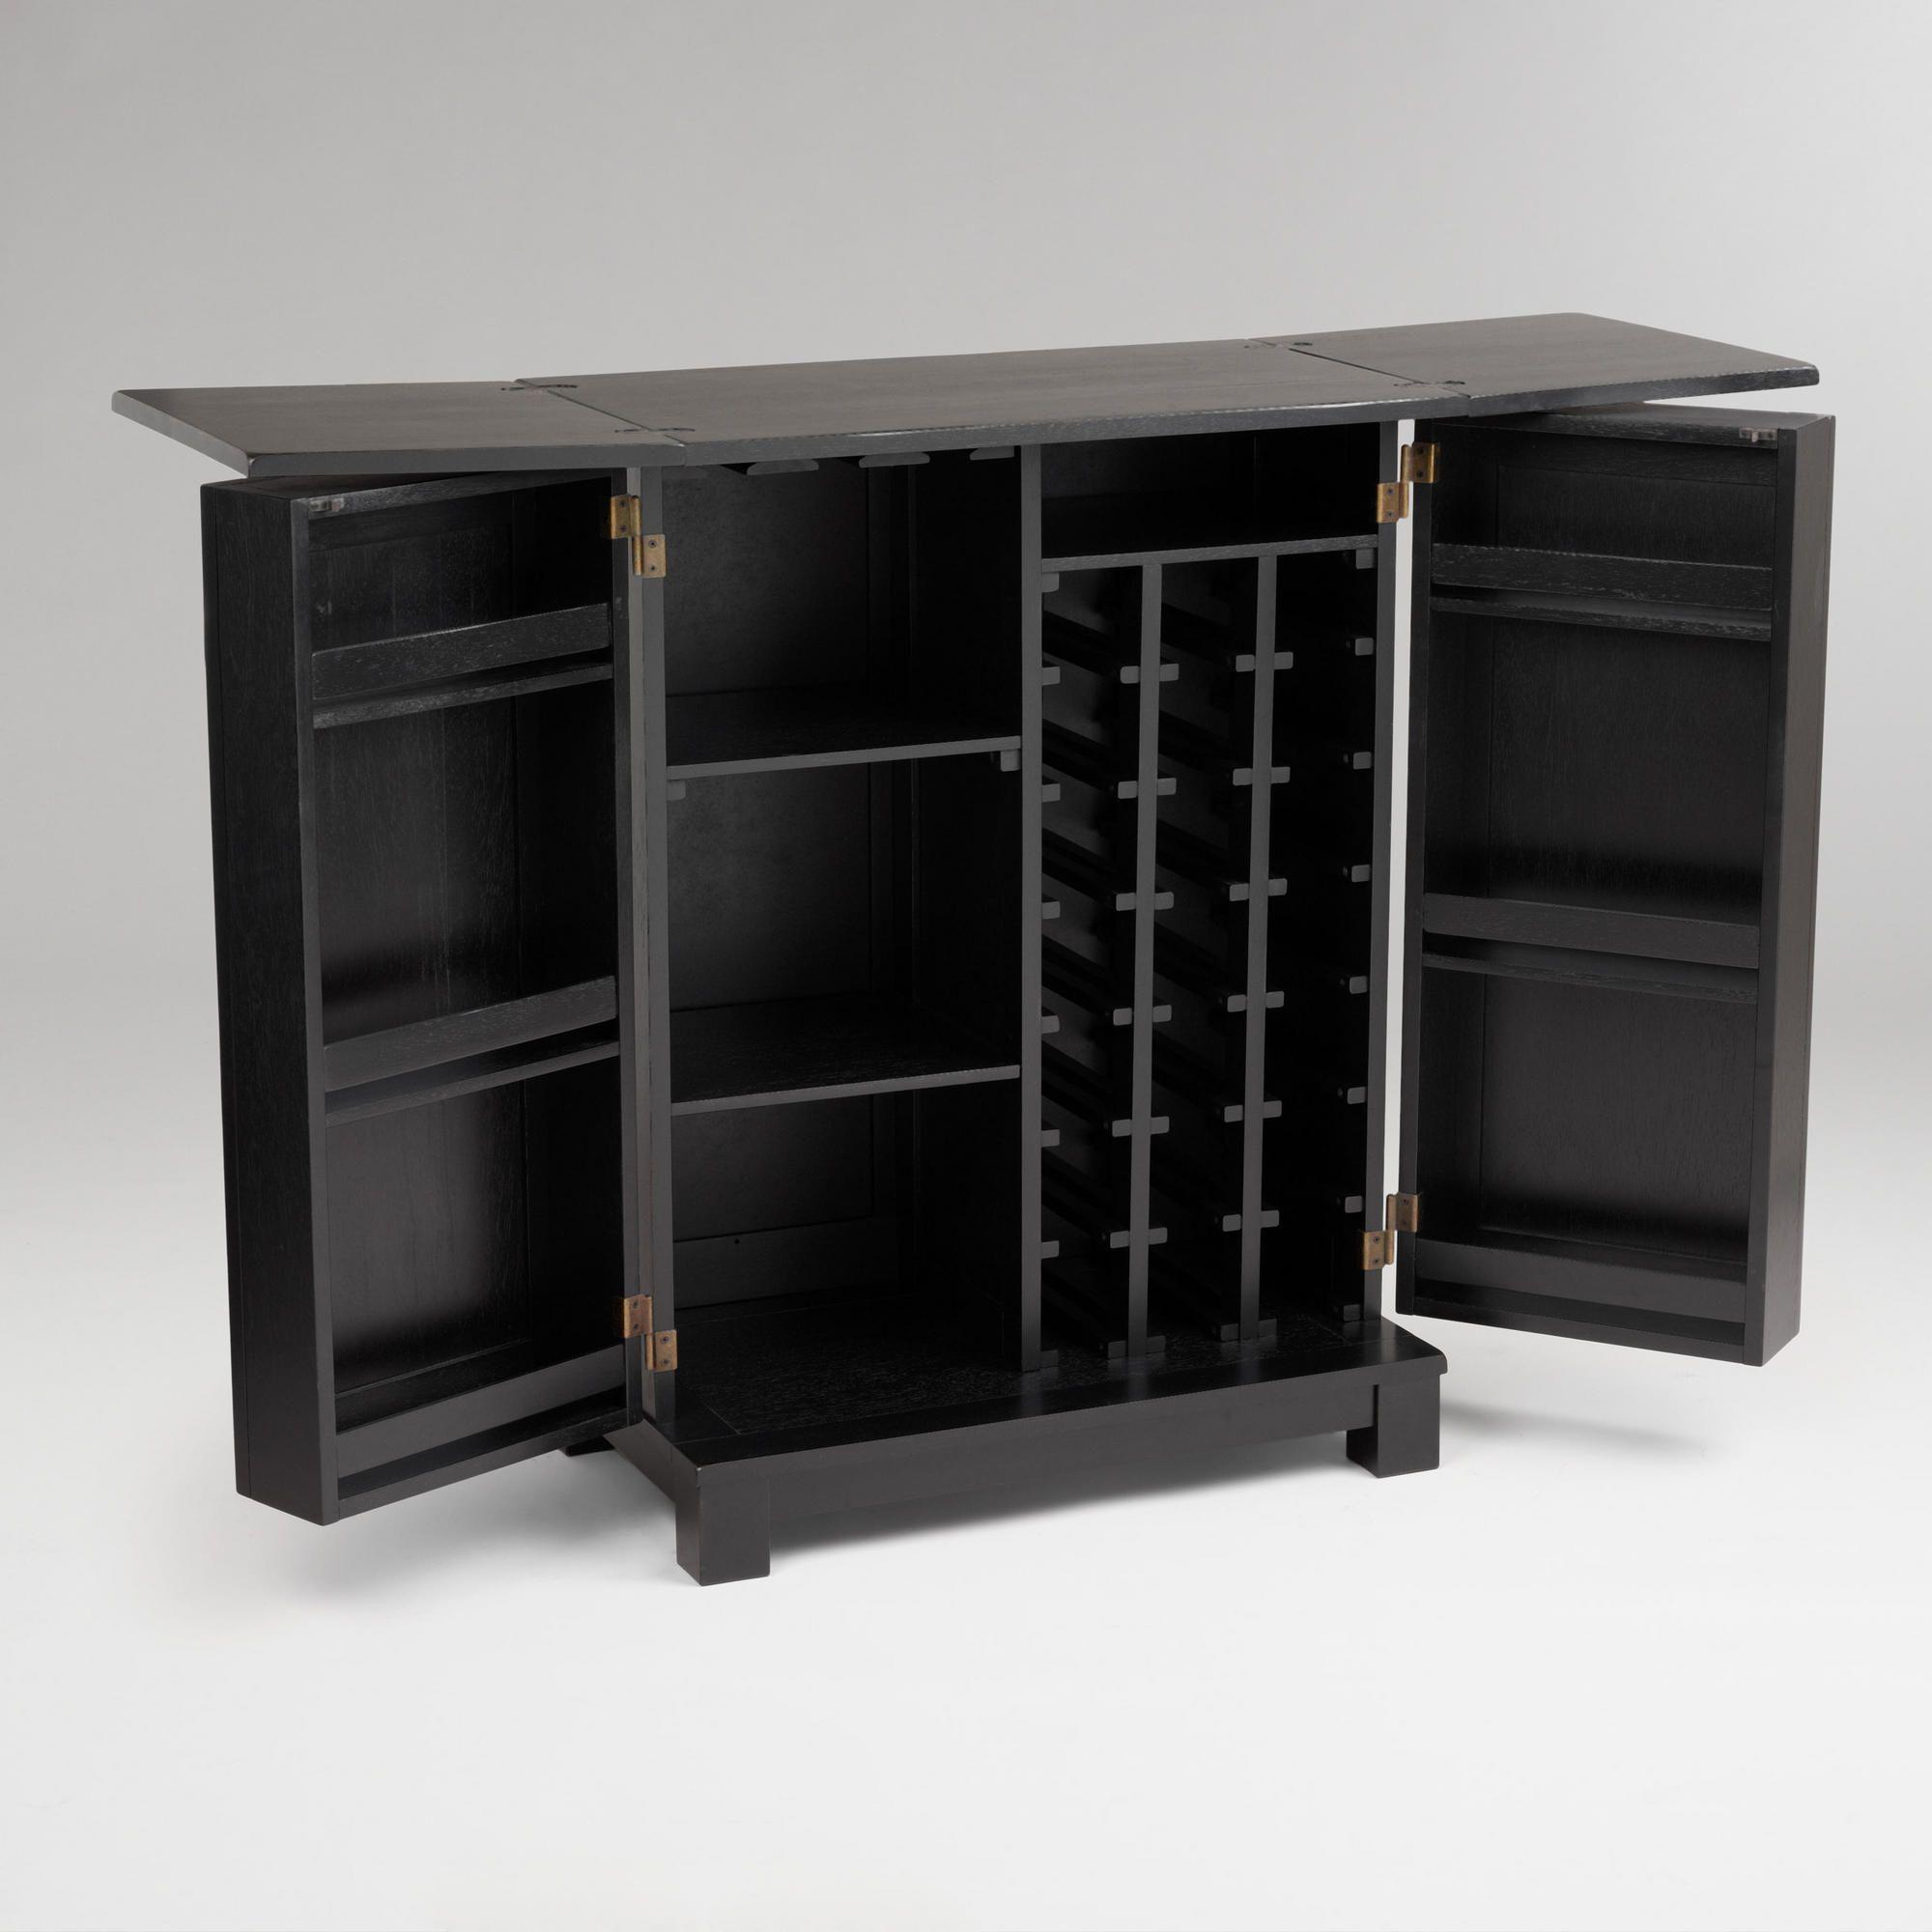 DIY bar cabinet/liquor cabinet | Home Inspiration ...